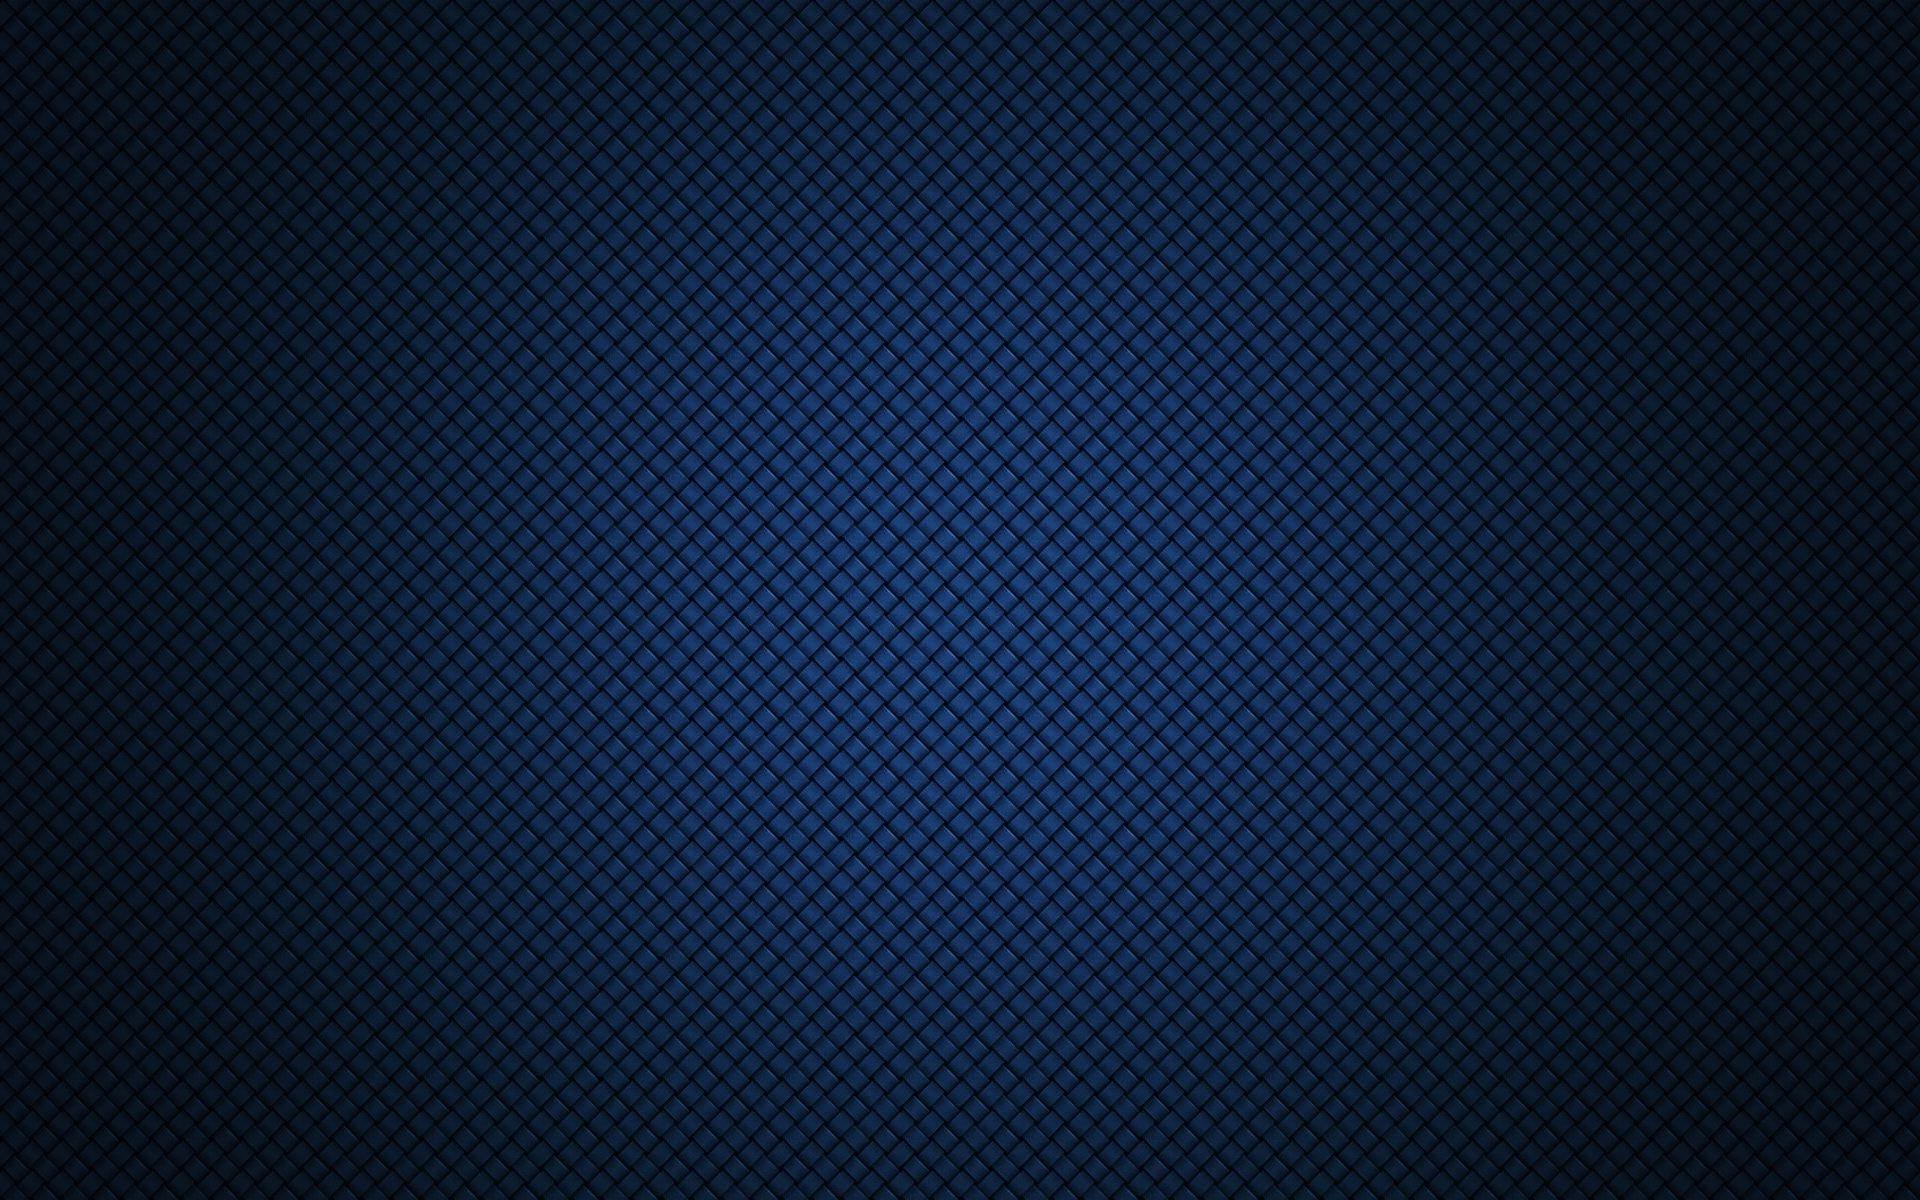 Dark blue checks plain HD wallpapers